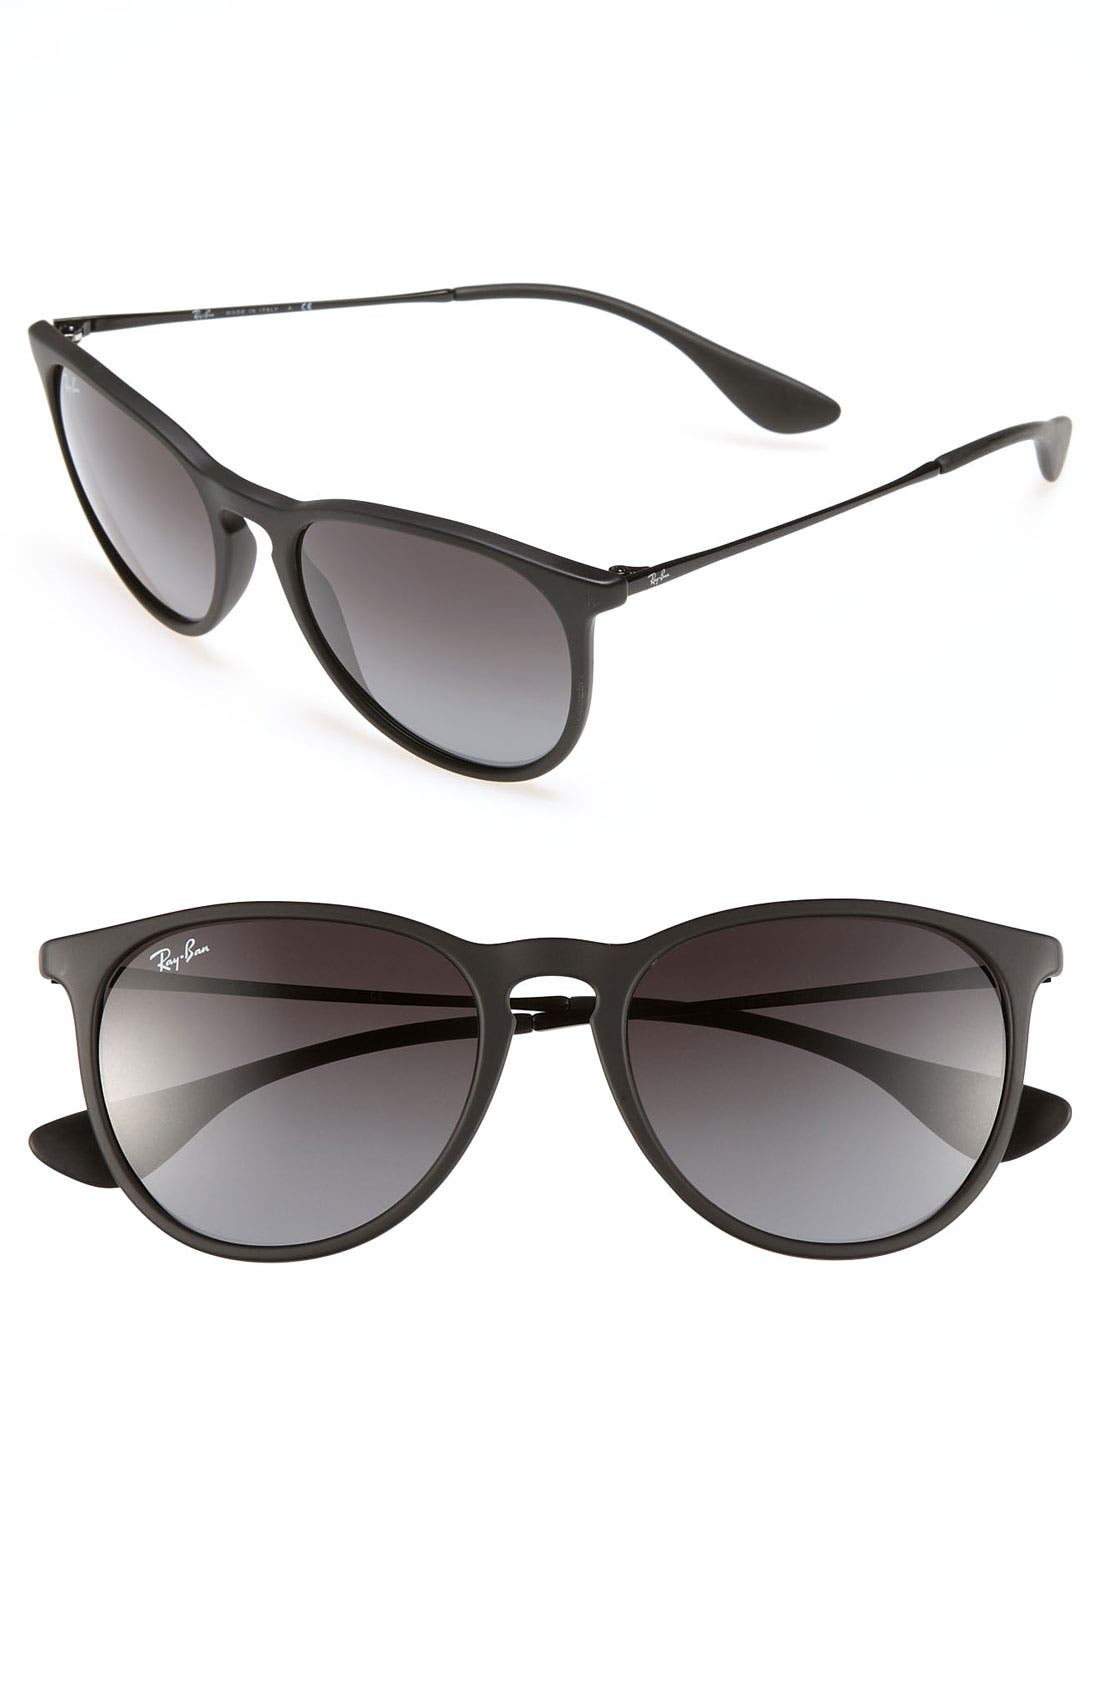 Ray-Ban Erika Classic 54mm Sunglasses